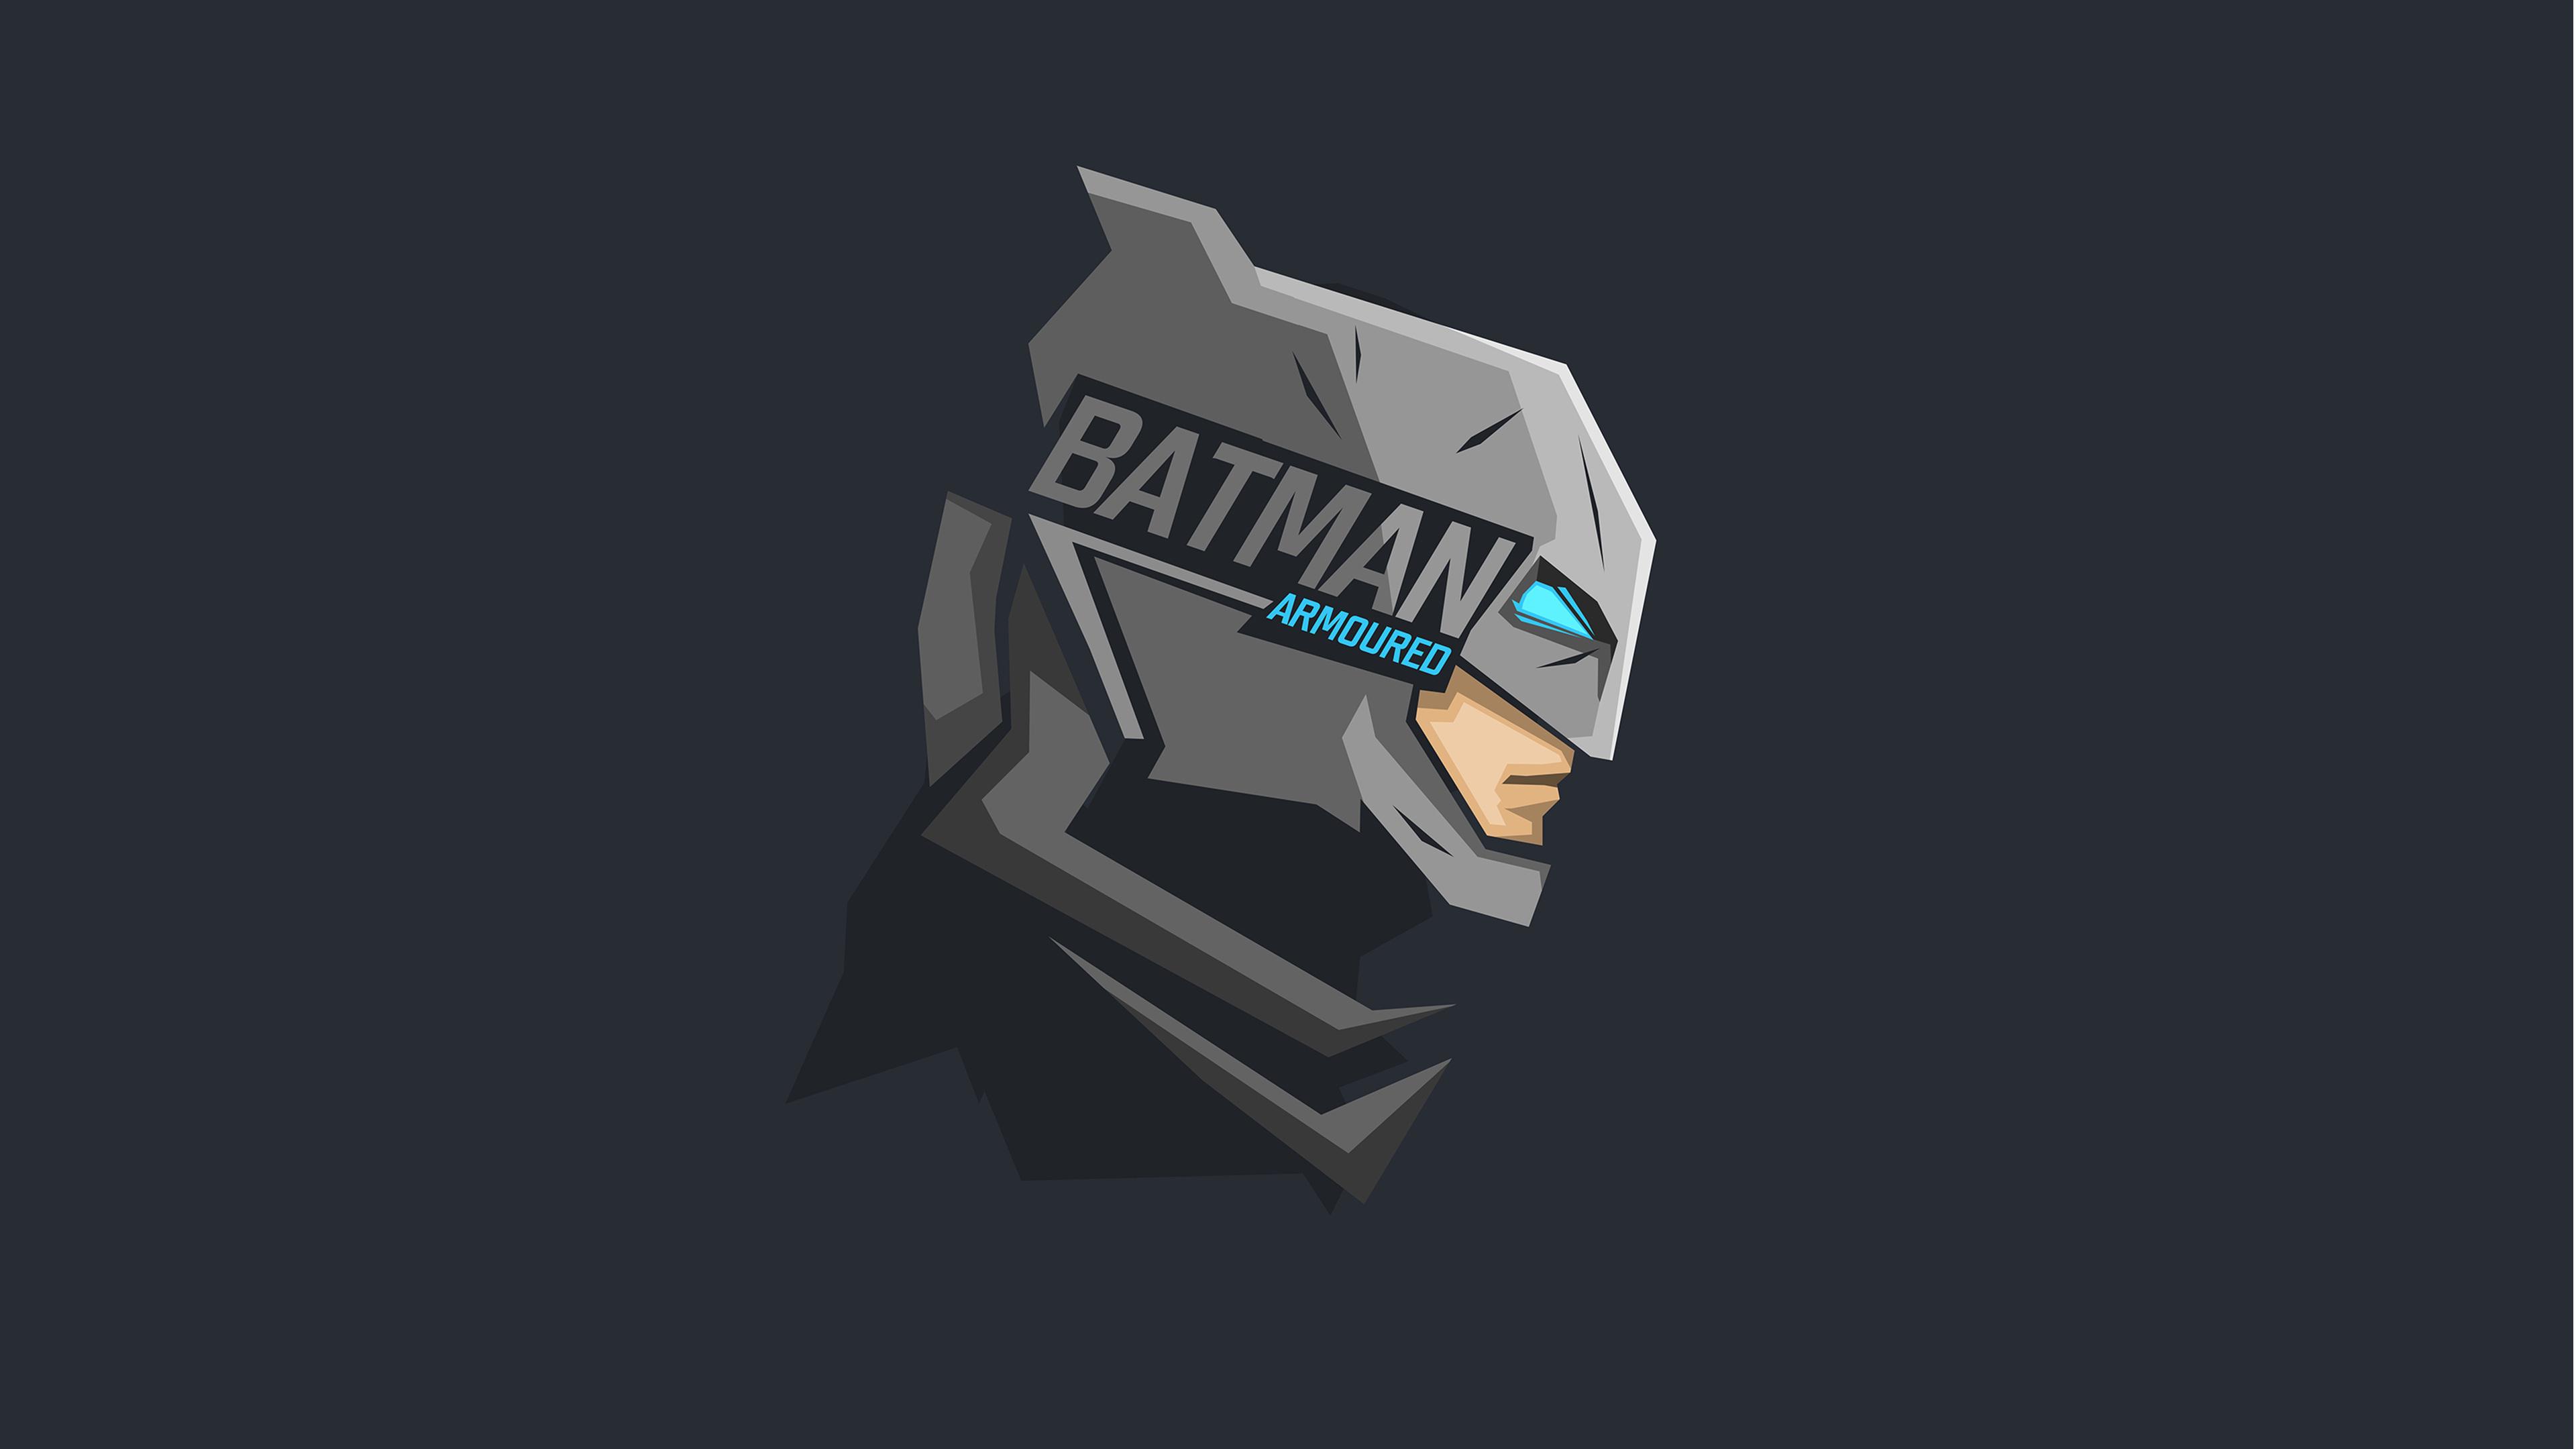 batman mask minimalism 8k 1536523690 - Batman Mask Minimalism 8k - superheroes wallpapers, minimalism wallpapers, hd-wallpapers, digital art wallpapers, batman wallpapers, artwork wallpapers, artstation wallpapers, artist wallpapers, 8k wallpapers, 5k wallpapers, 4k-wallpapers